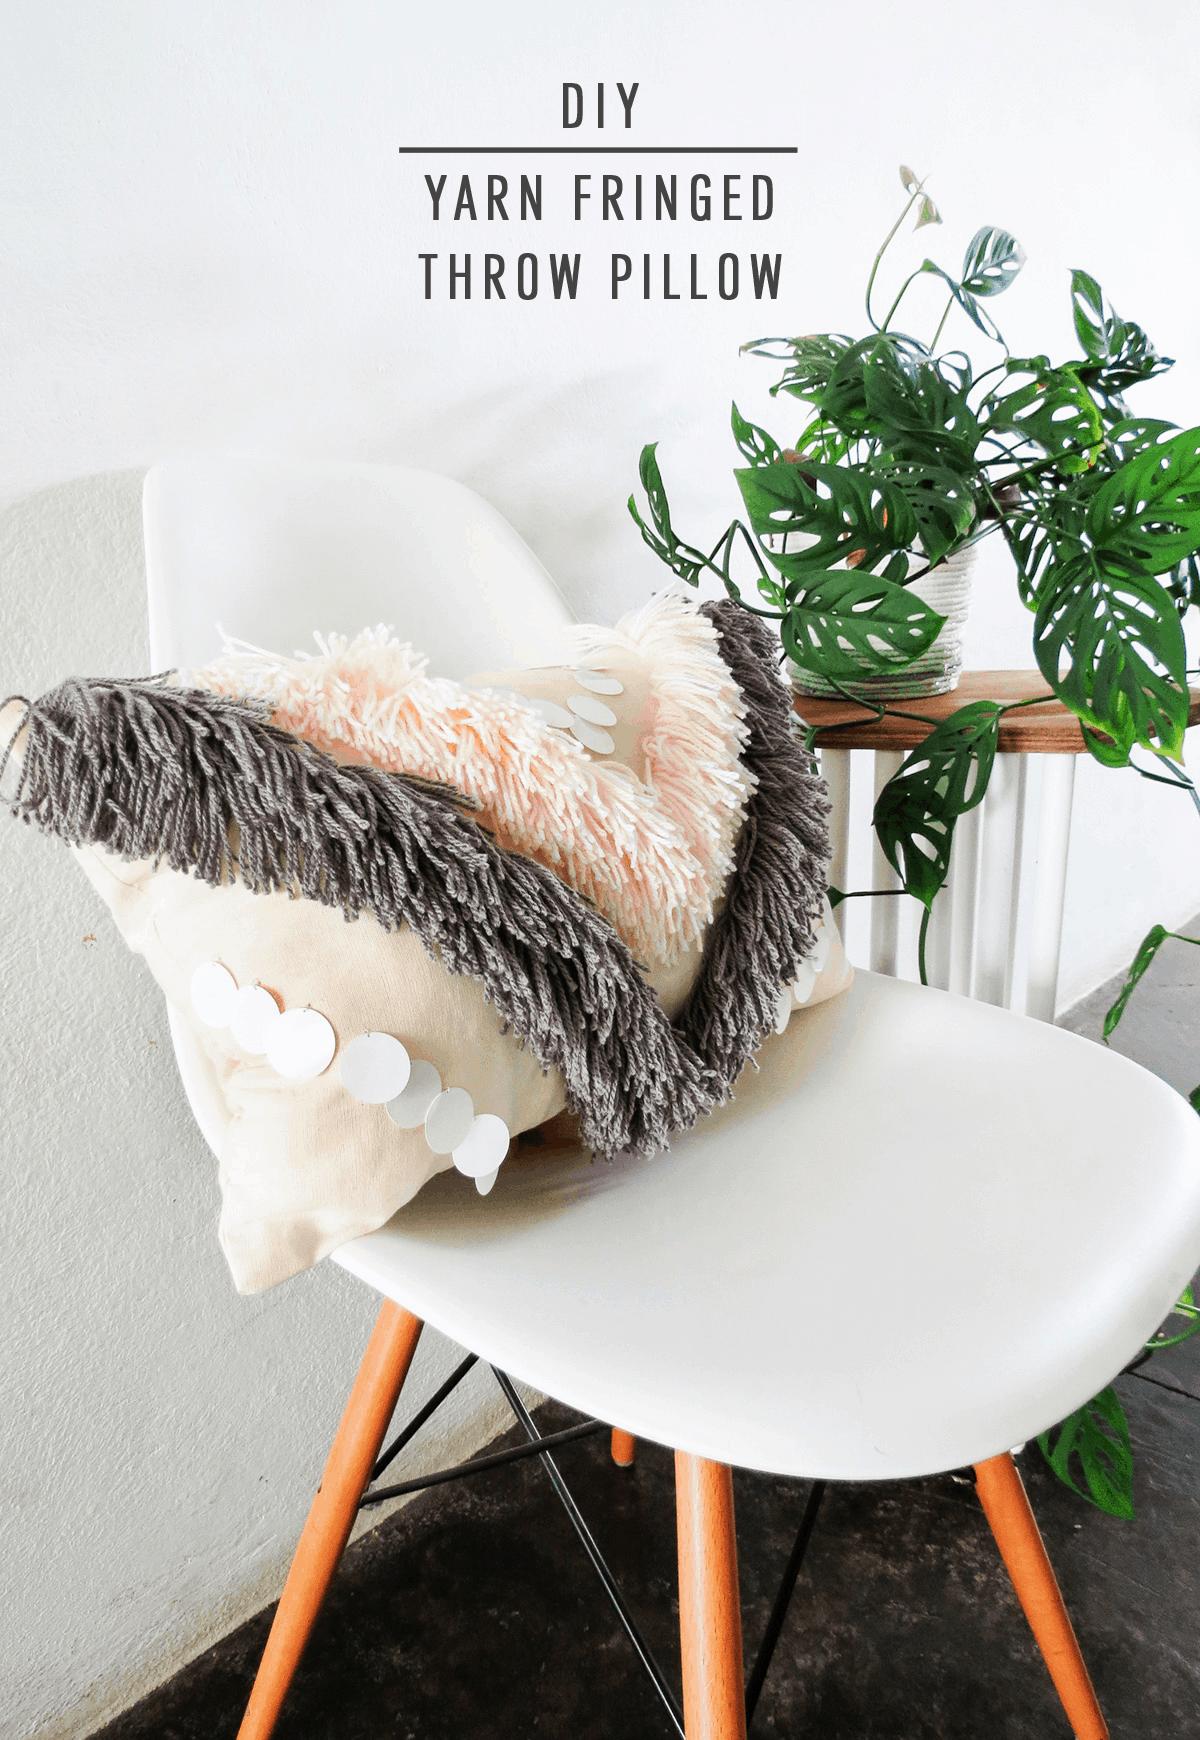 DIY Woven Yarn Fringe Throw Pillow by Ashley Rose of Sugar & Cloth, a top lifestyle blog in Houston, Texas